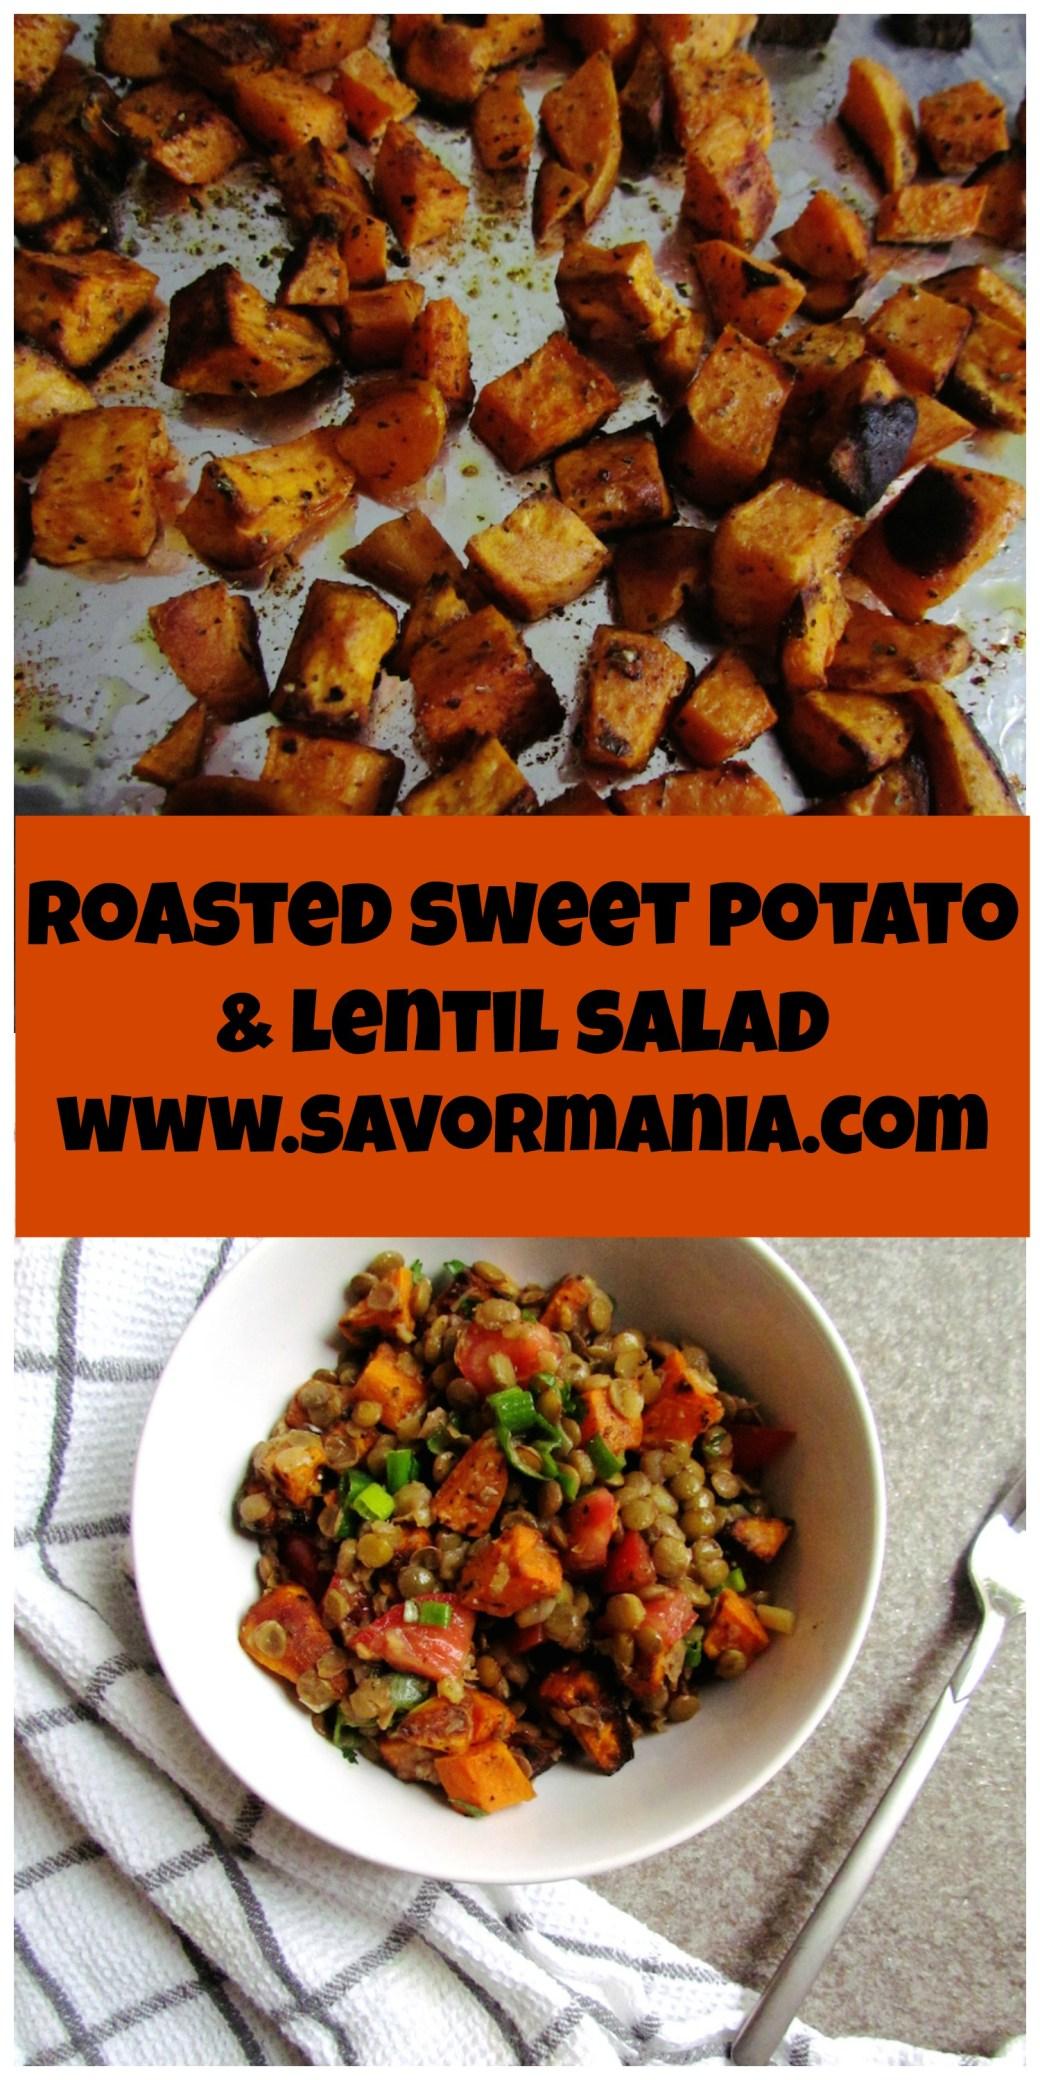 roasted sweet potato and lentil salad   www.savormania.com